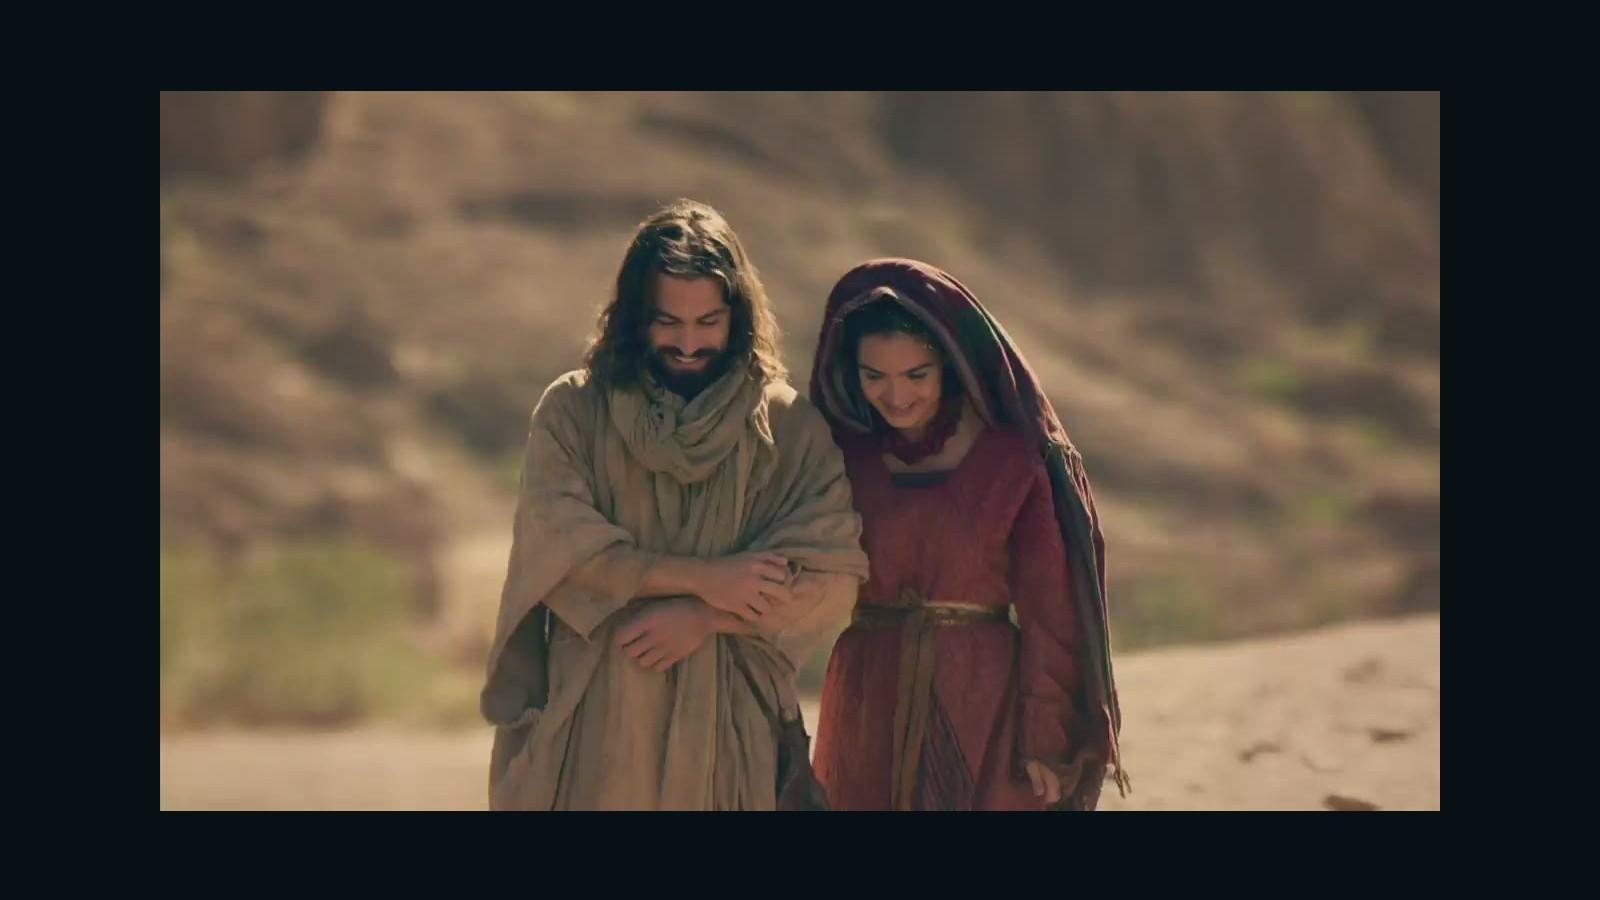 funding jesus who bankrolled christ u0027s ministry cnn